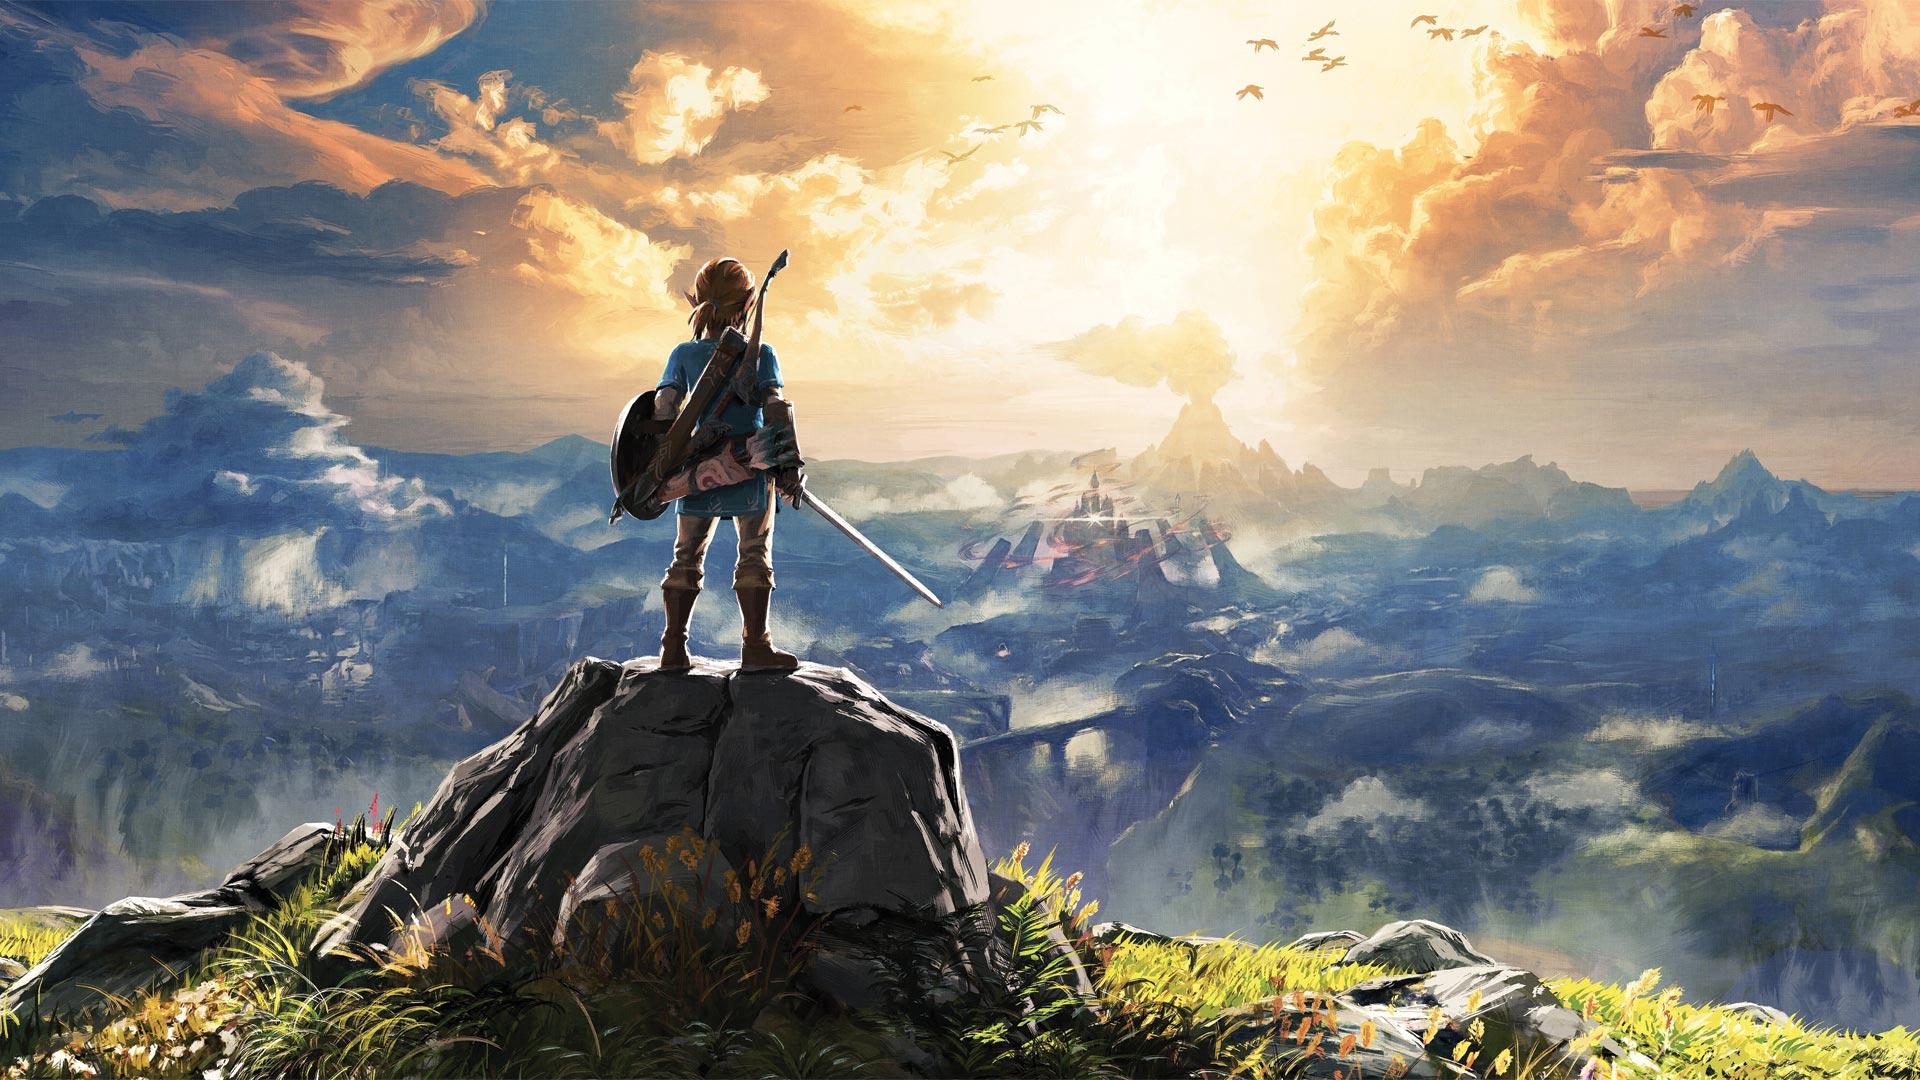 塞尔达传说:荒野之息(The Legend of Zelda: Breath of the Wild)插图2